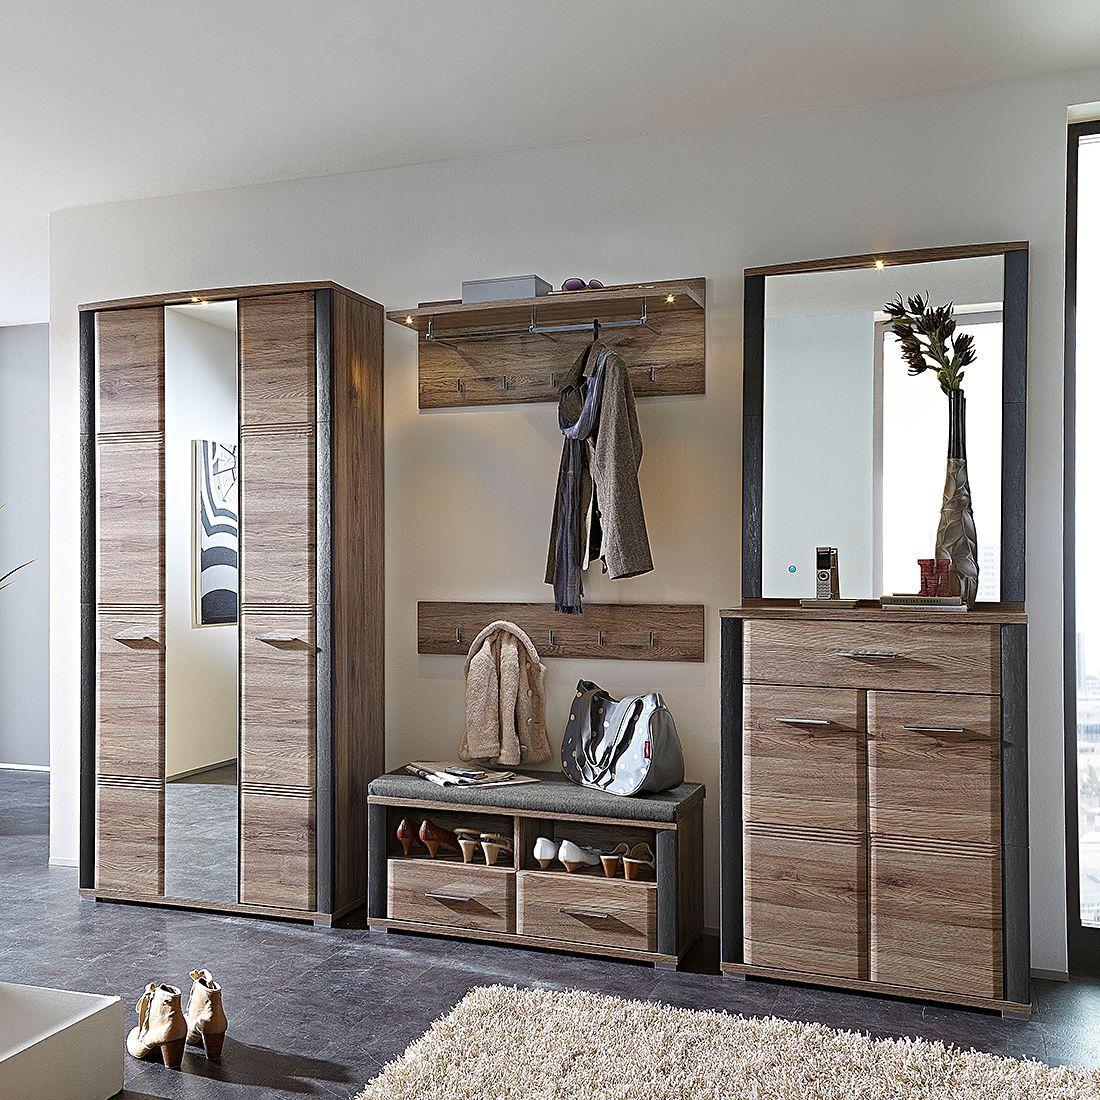 Garderobe Skanderborg Ii 6 Teilig Dizajn Prihozhej Dizajn